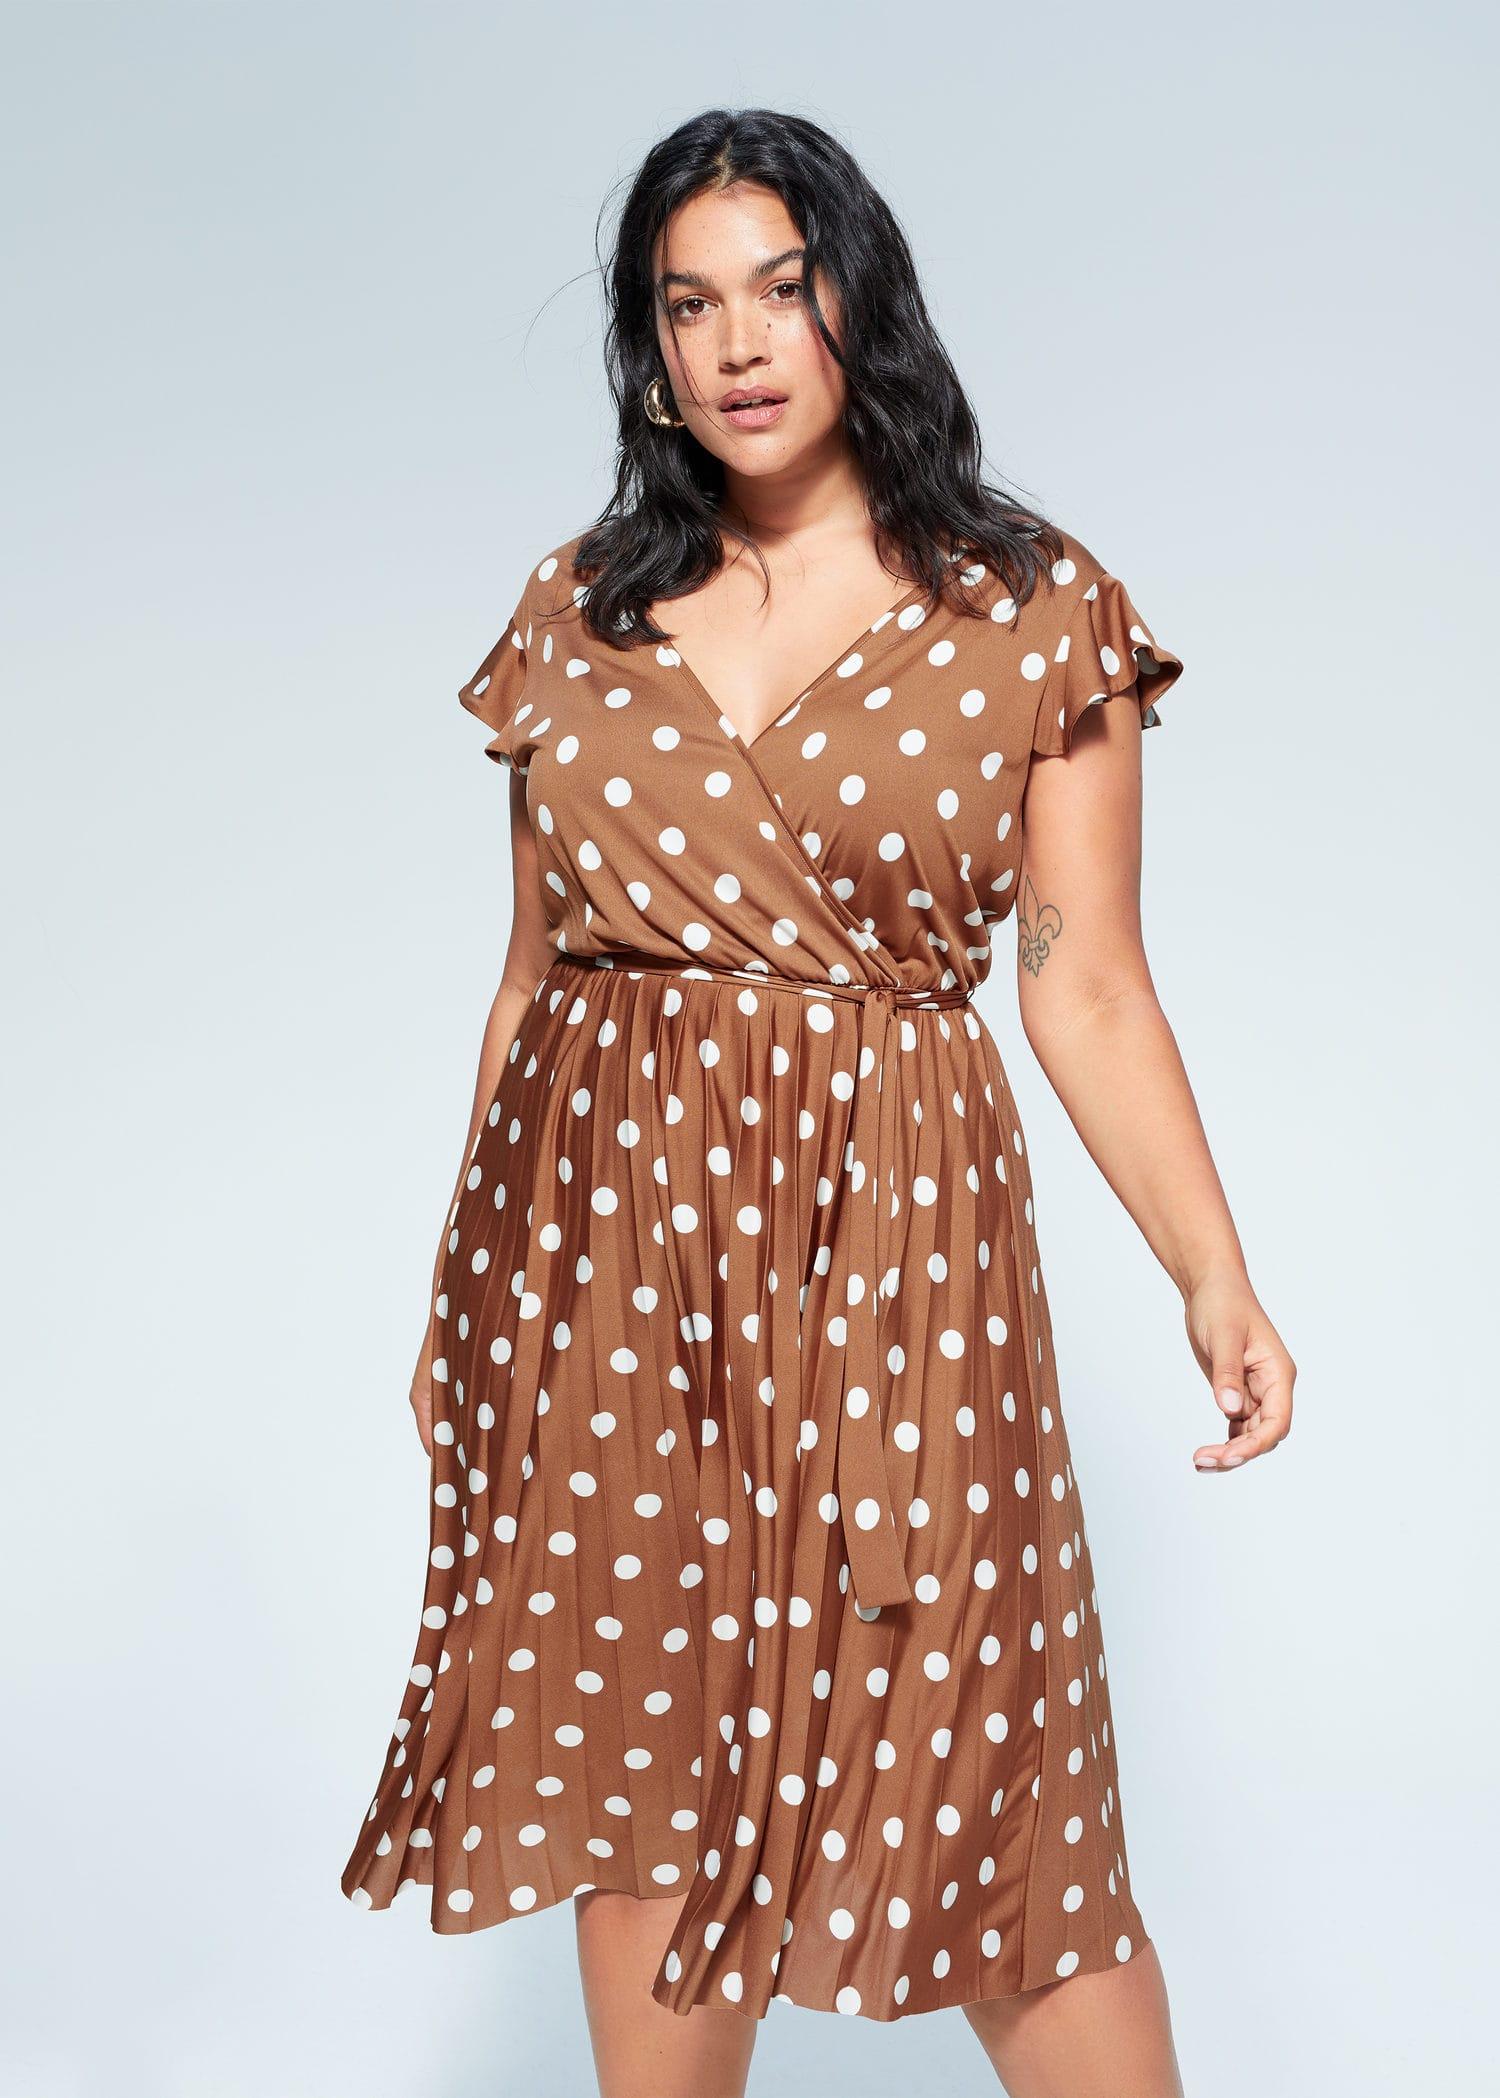 Polka Dot Pleated Dress Plus Sizes Violeta By Mango Usa